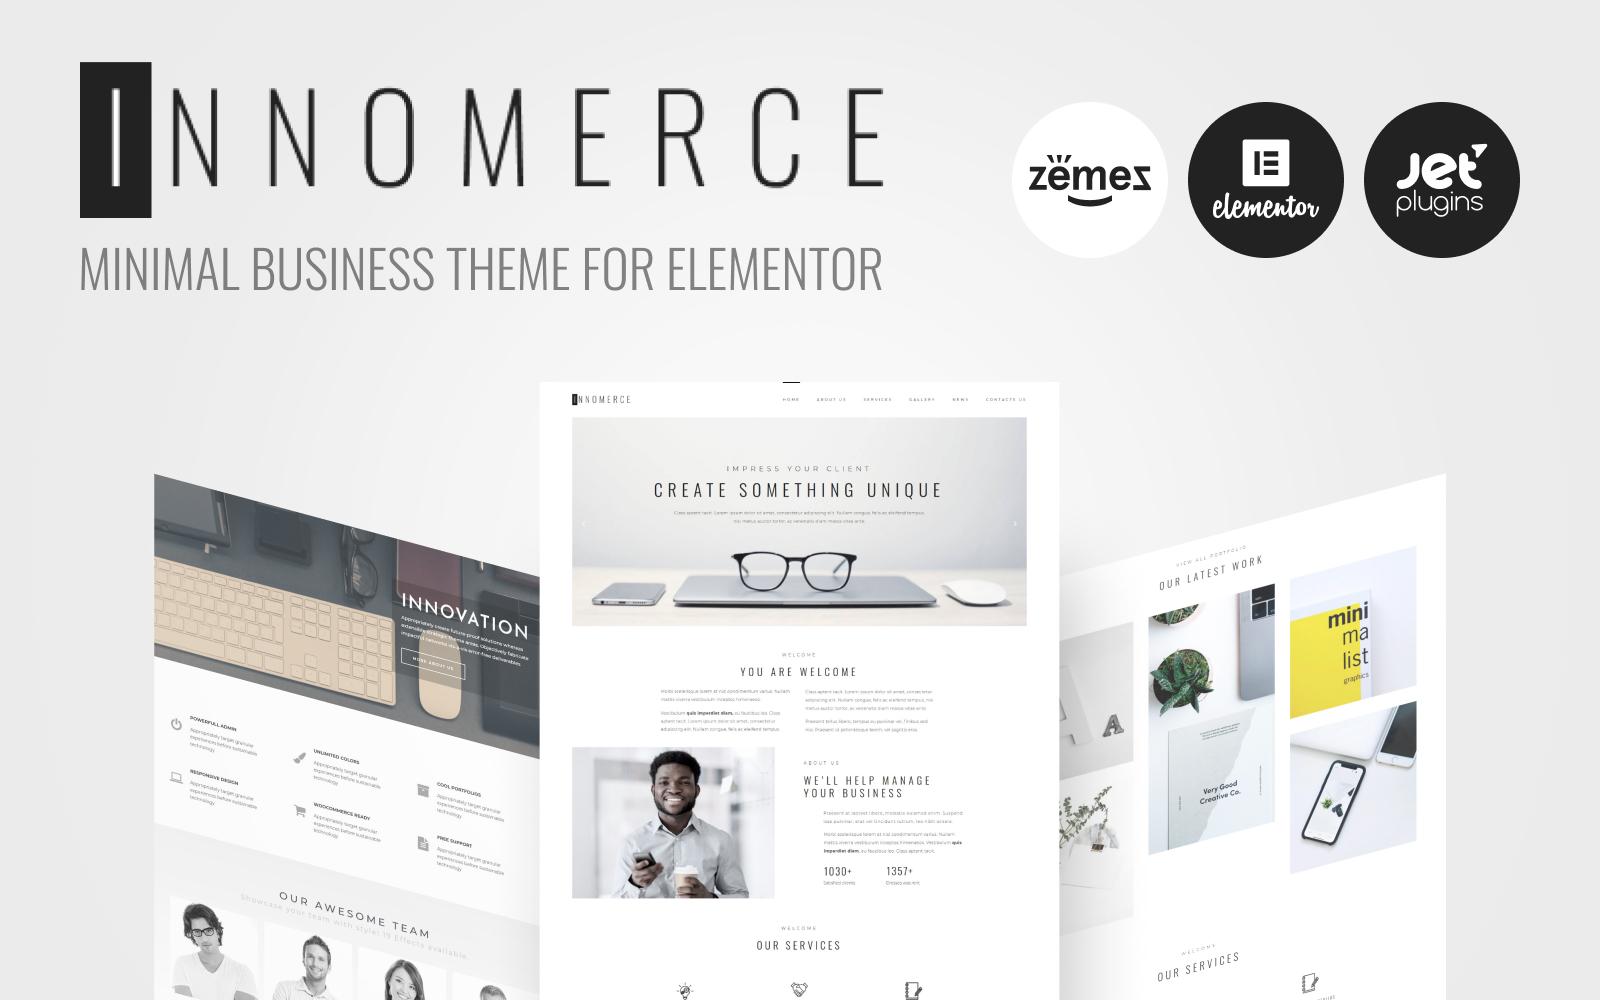 Innomerce - Business Multipurpose Minimal Elementor Tema WordPress №81170